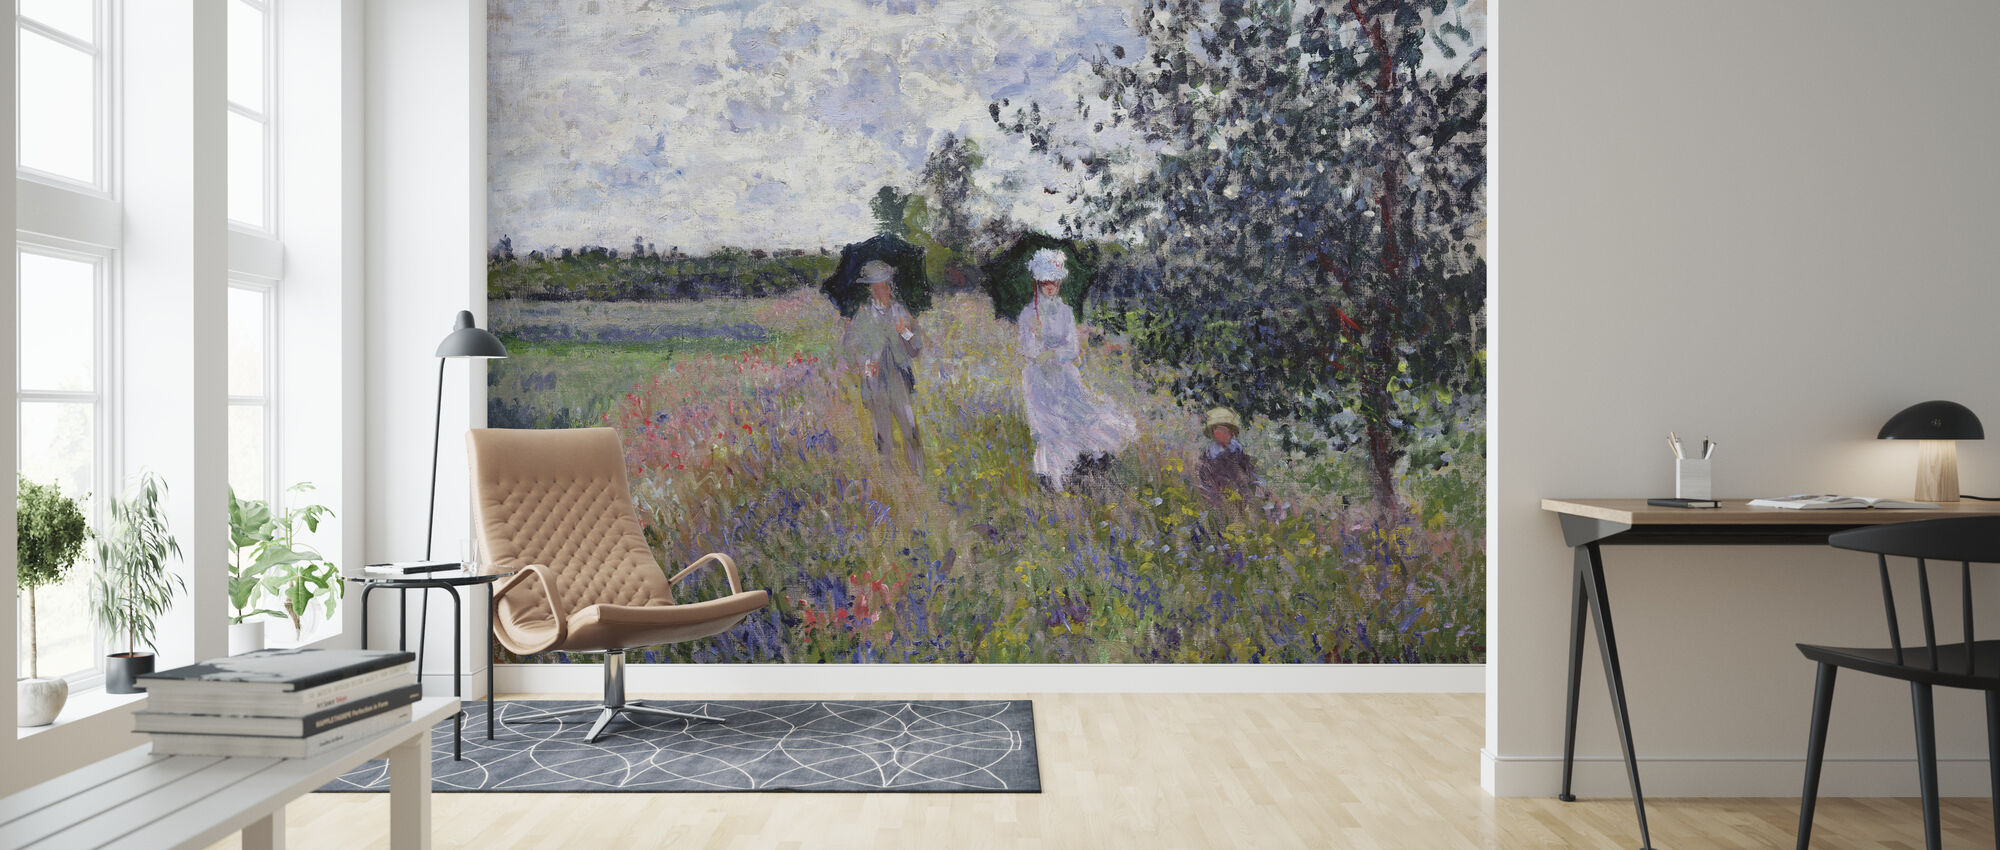 Promenade - Claude Monet - Wallpaper - Living Room